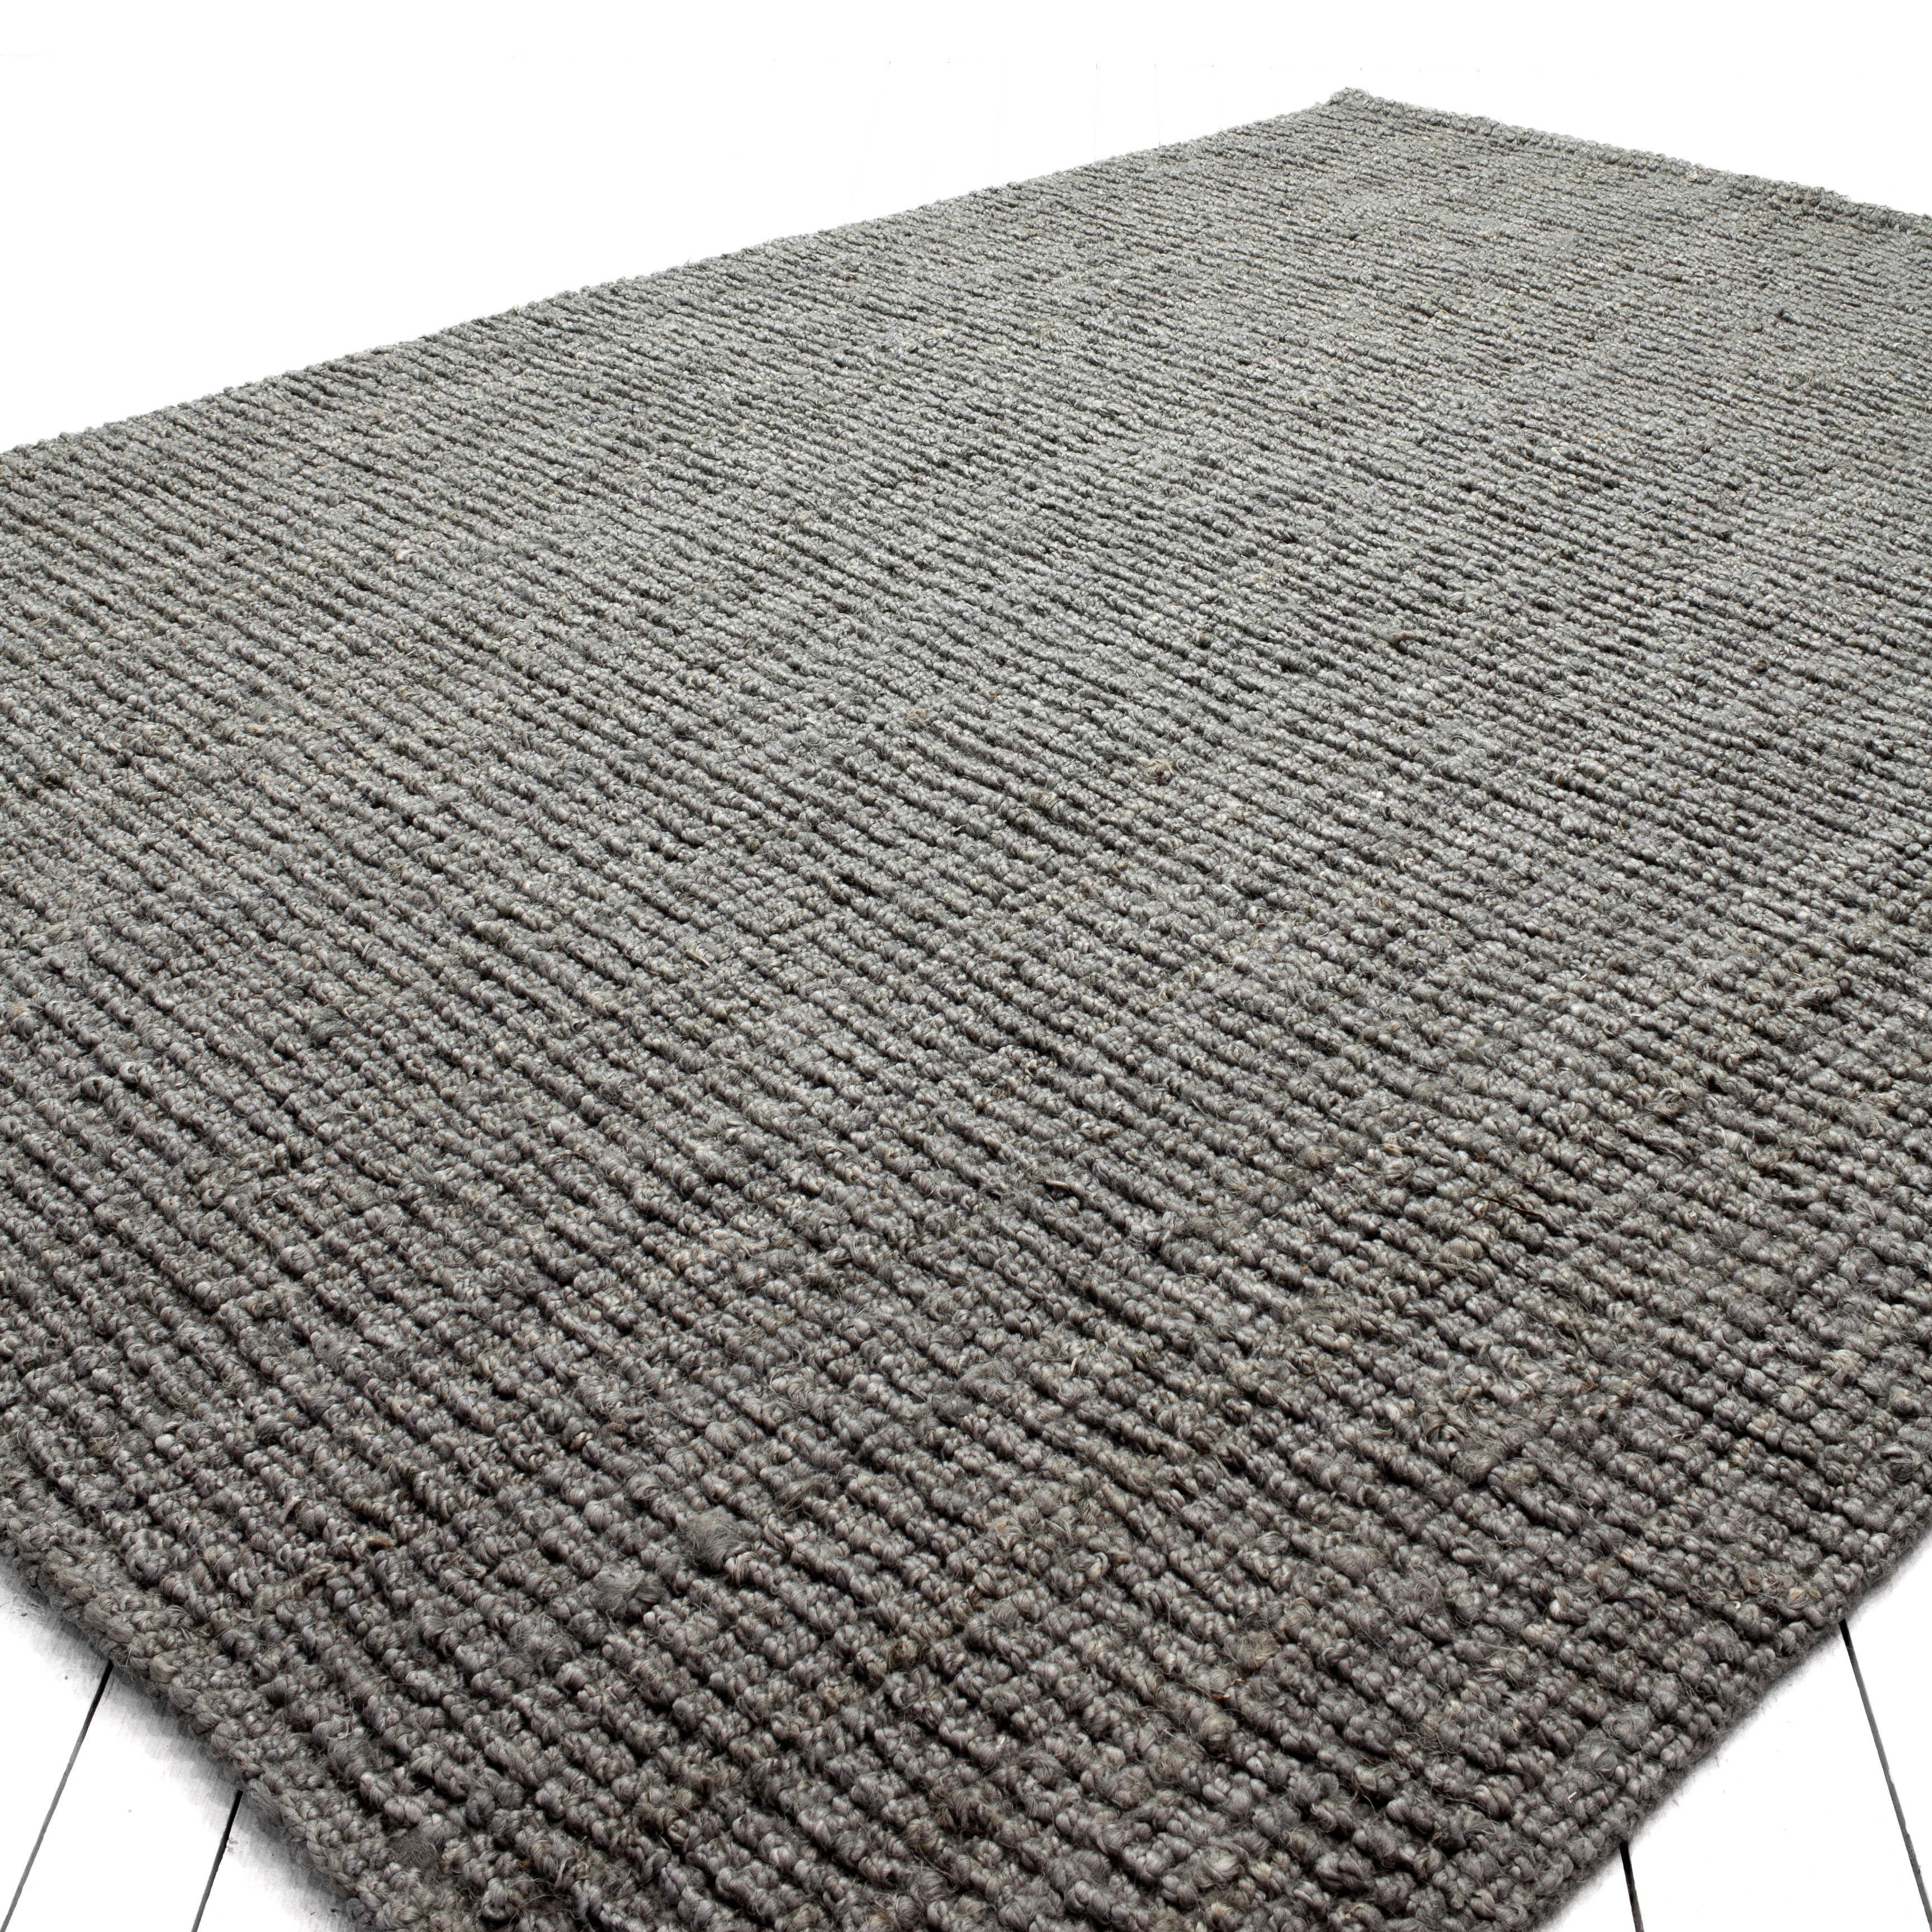 Gray Jute Rugs